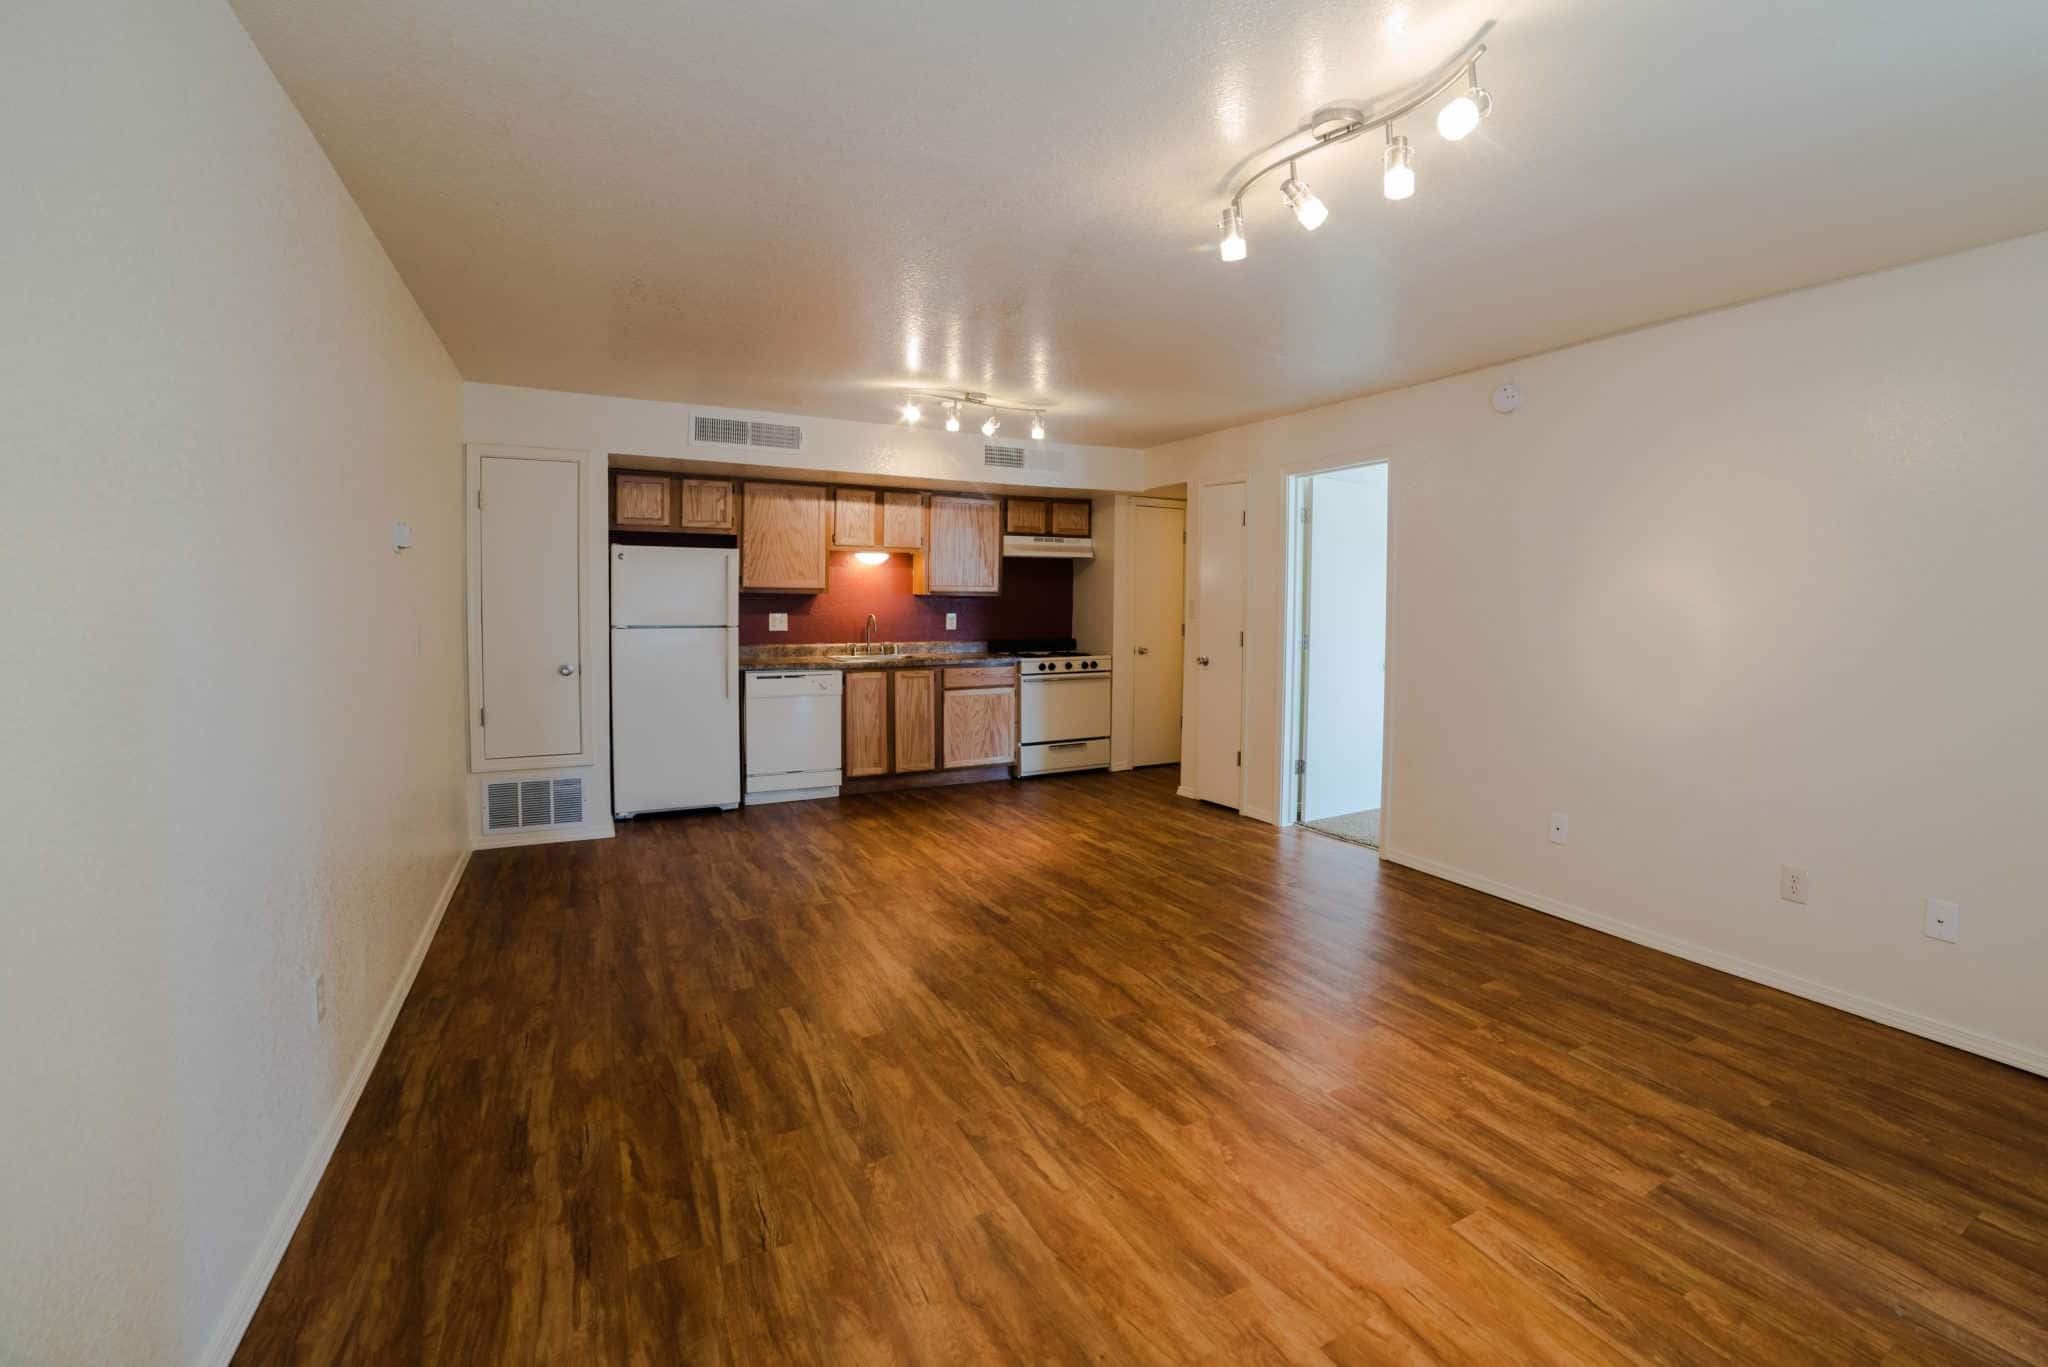 OMNI Apartments Kitchen